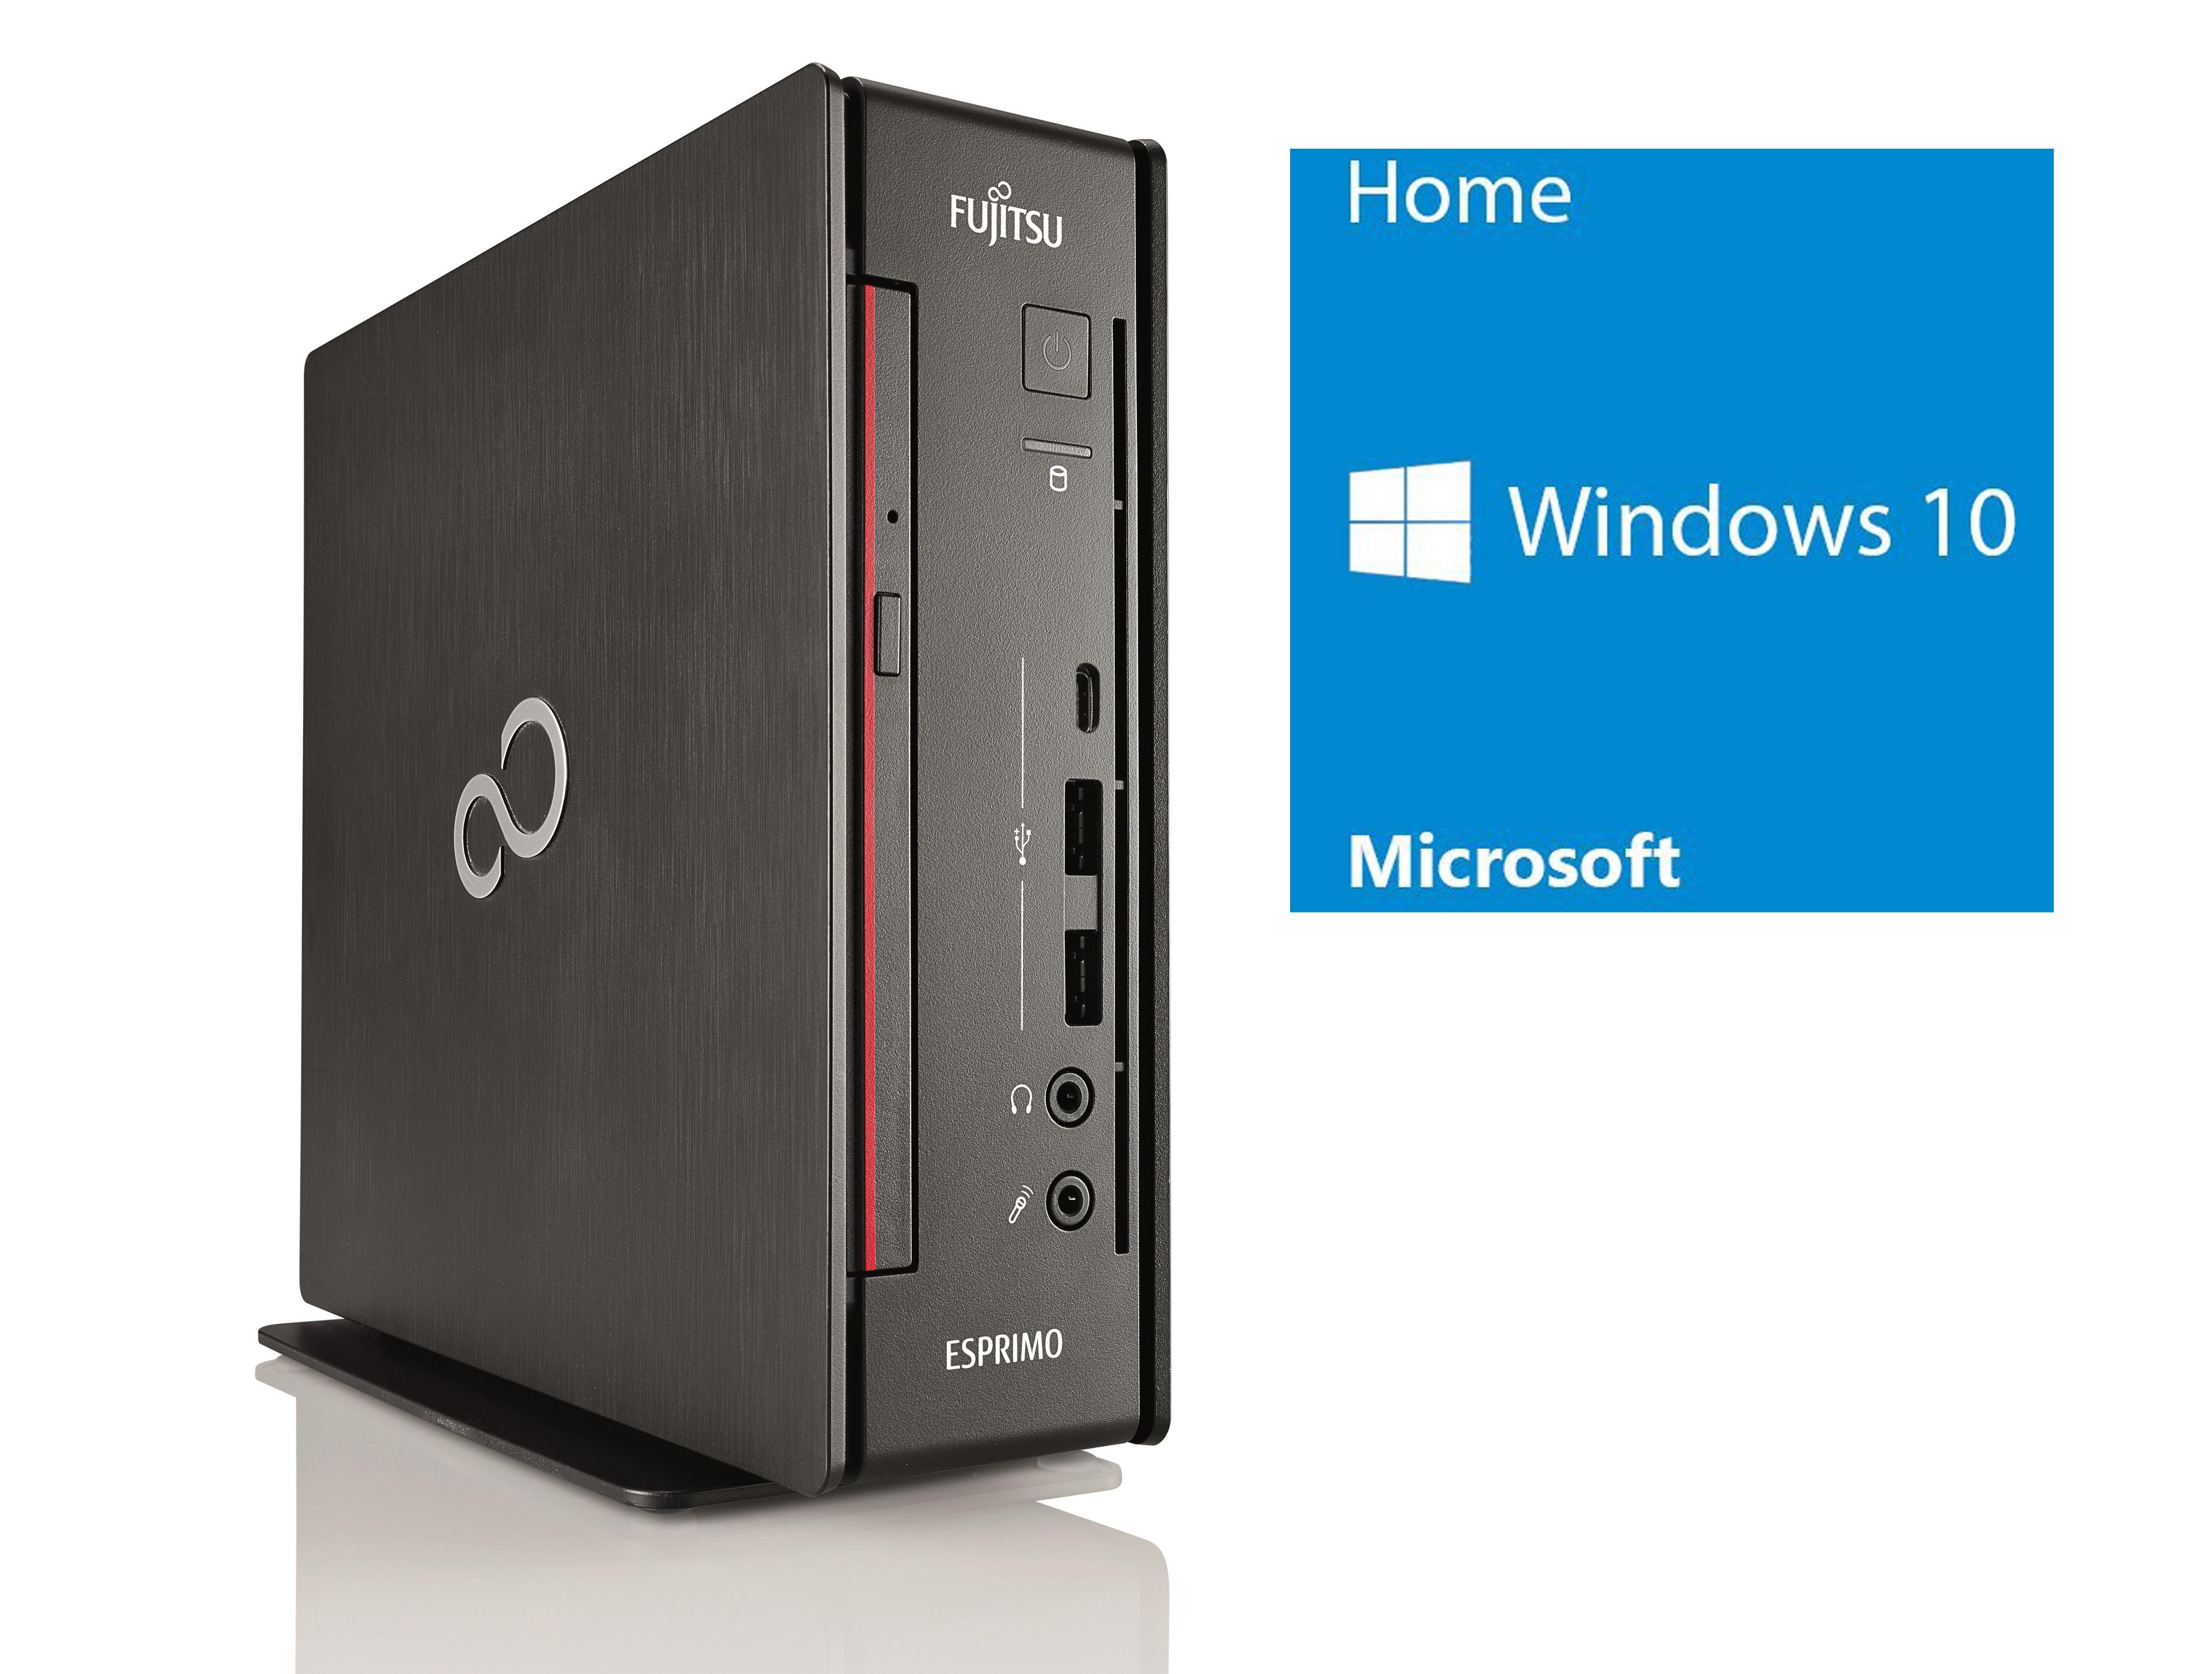 Fujitsu Esprimo Q957 Intel Core i5 6500T 2 5 GHz 8GB RAM 128GB SSD ohne LW Win10Home